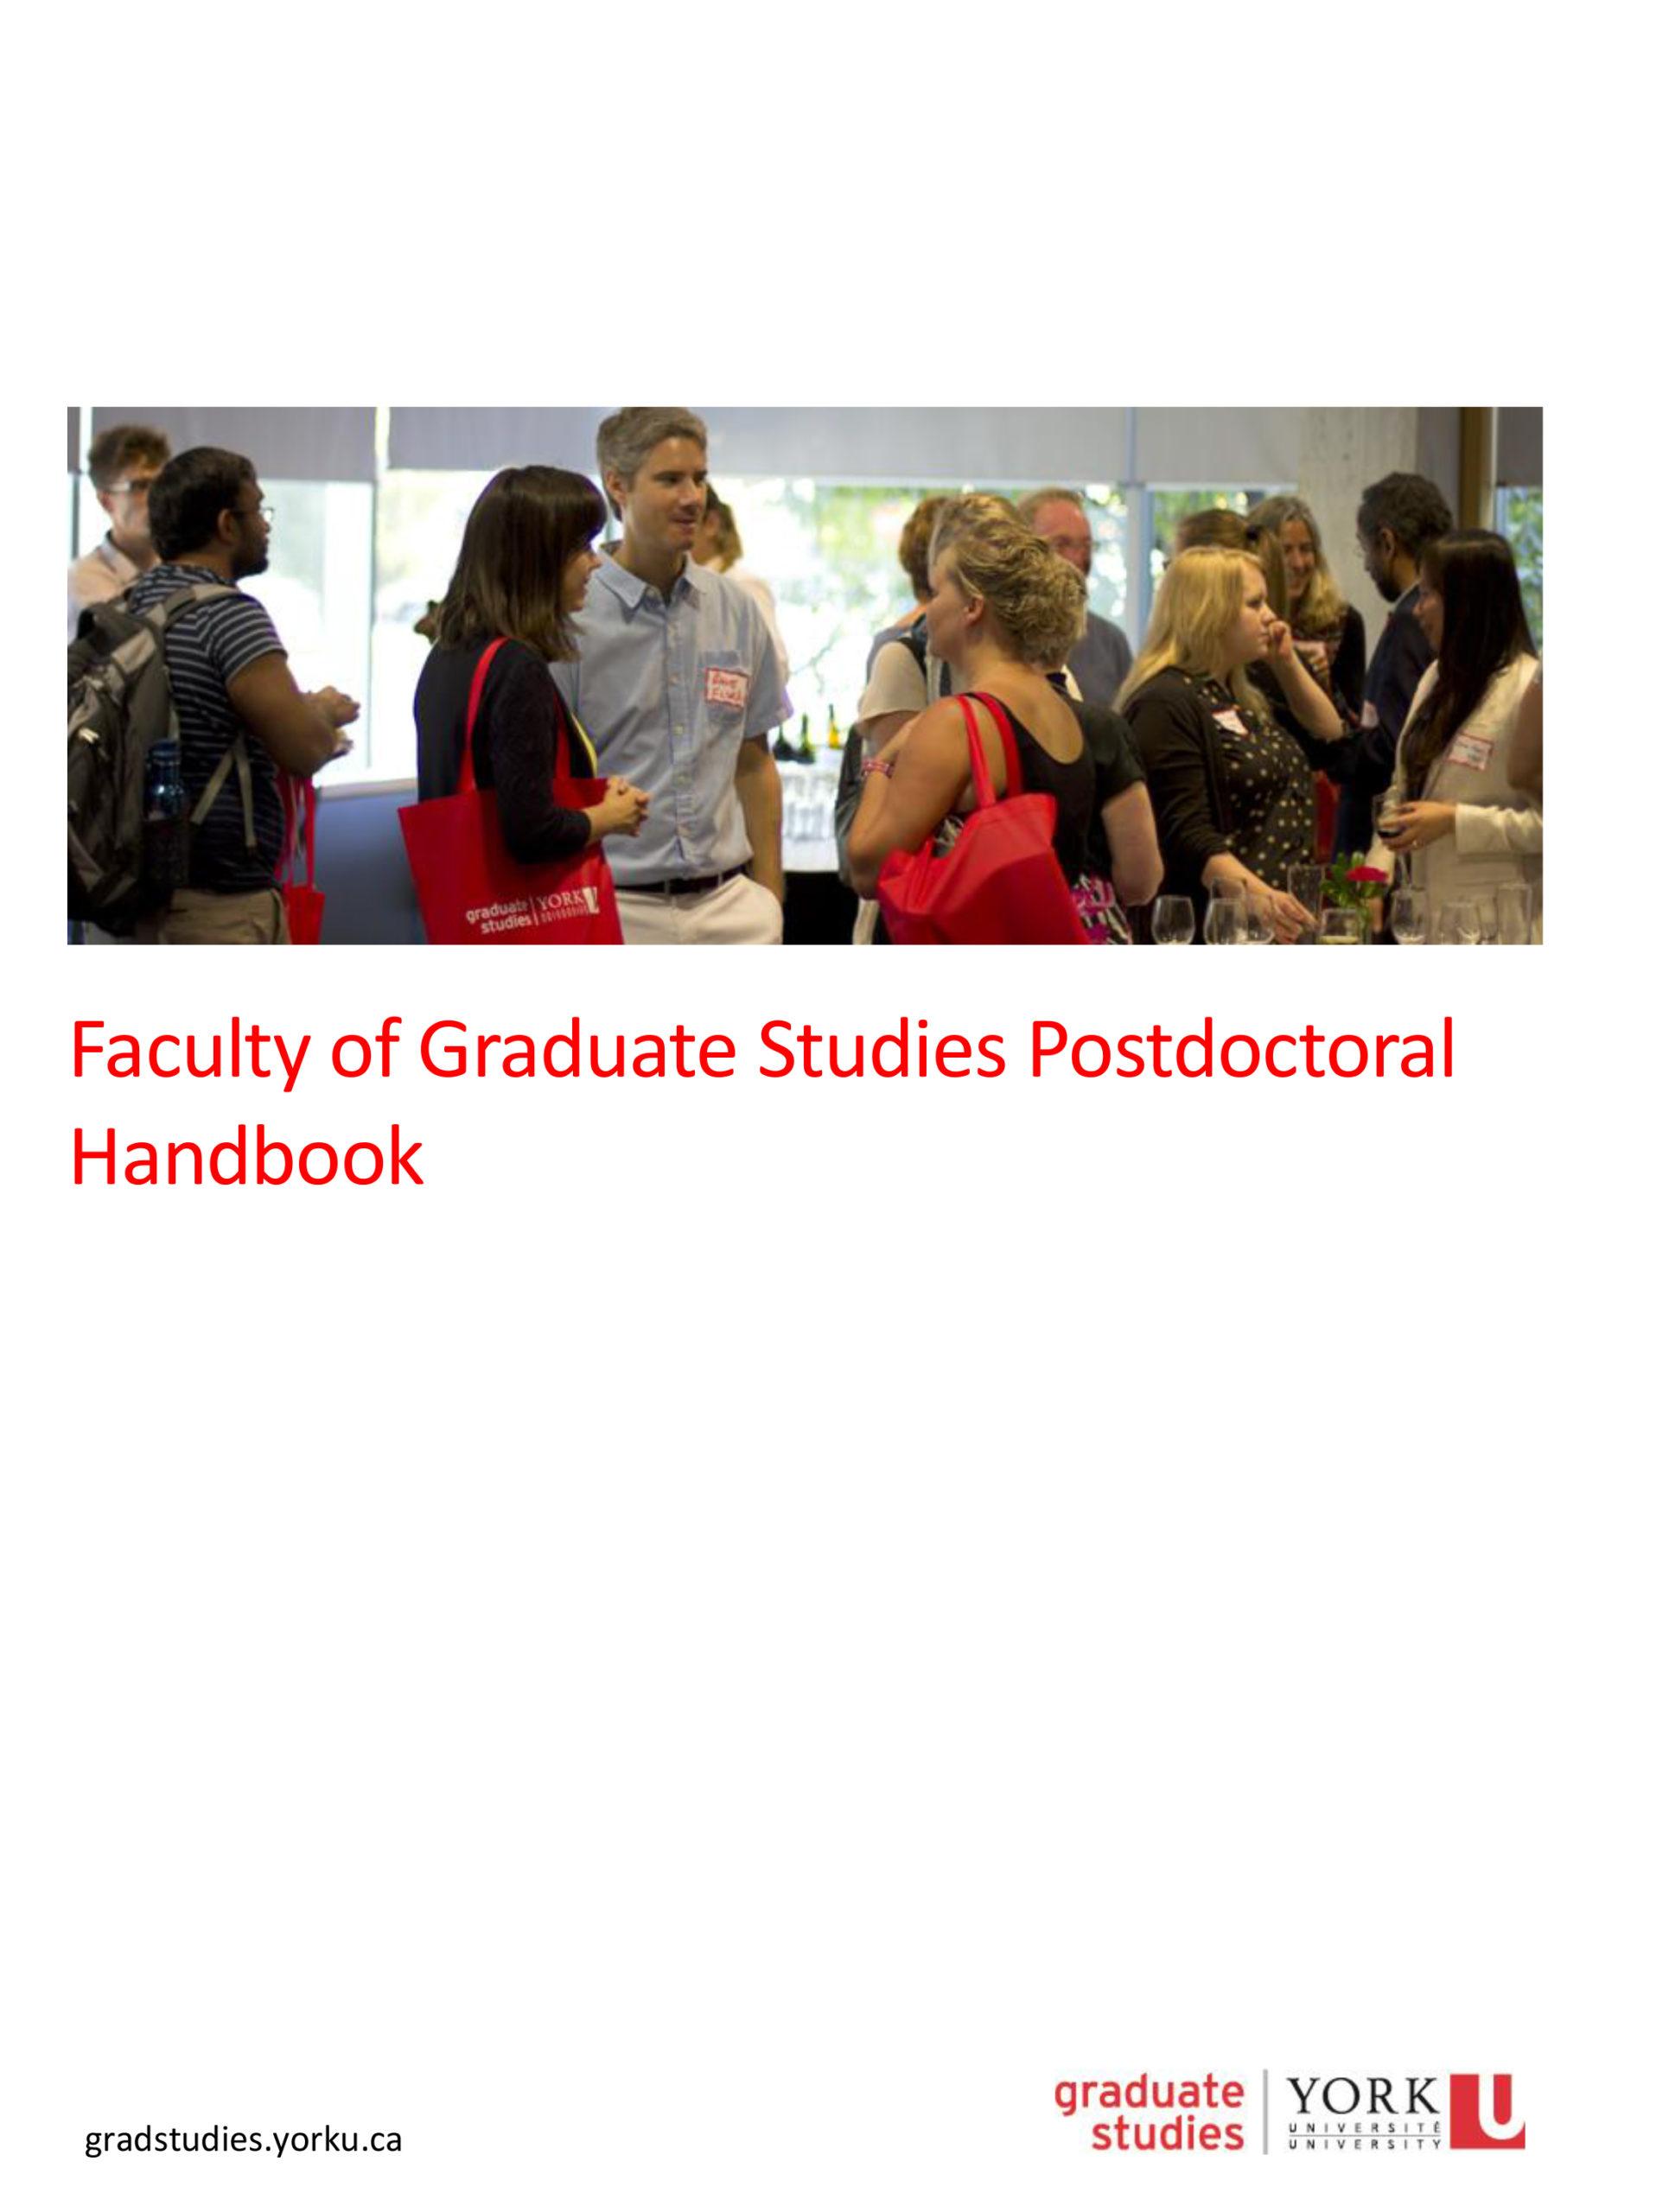 Postdoctoral Handbook